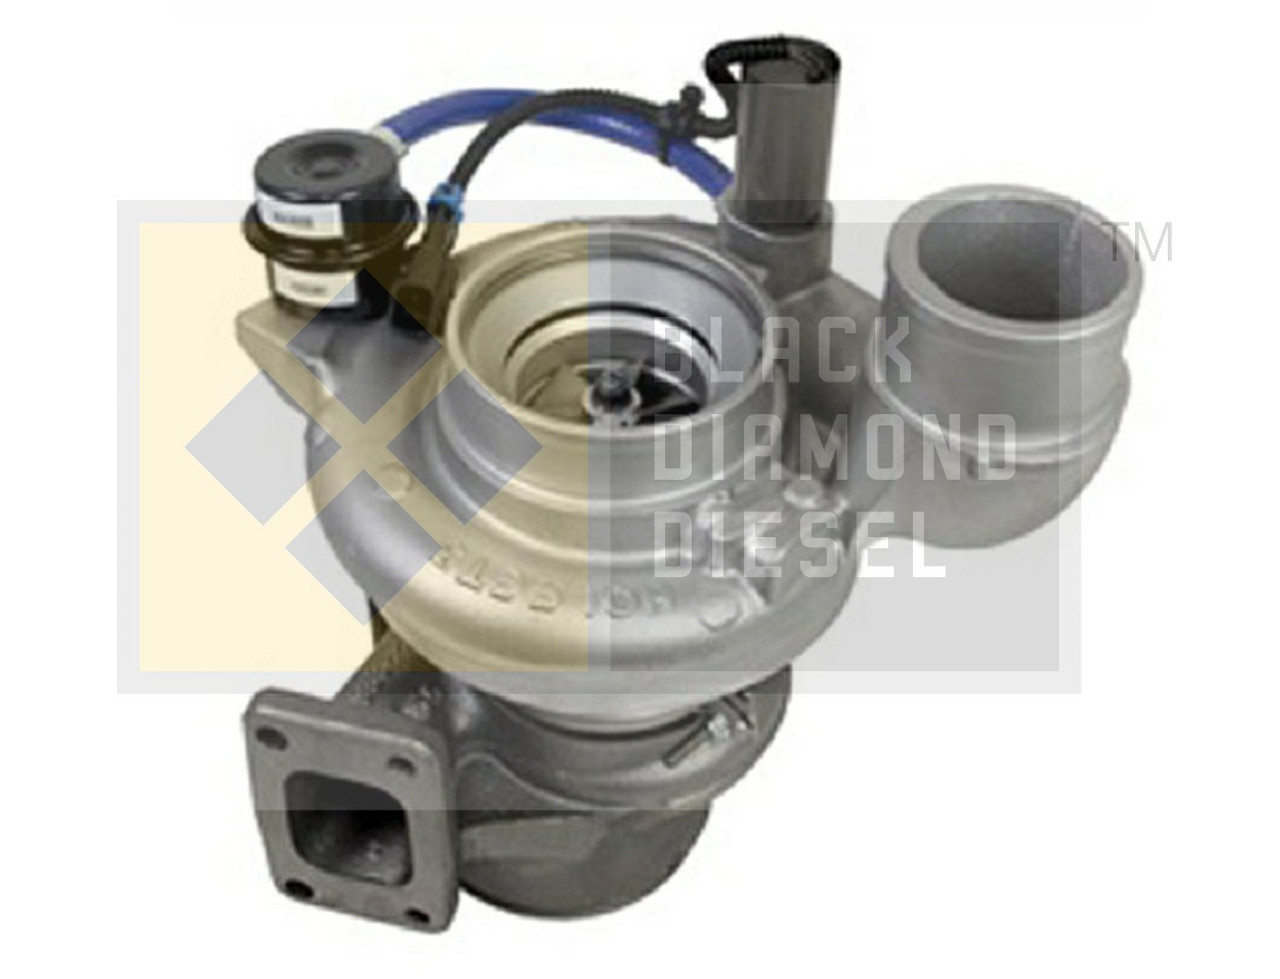 03-04 Dodge 5.9 Cummins Diesel Replacement Turbocharger